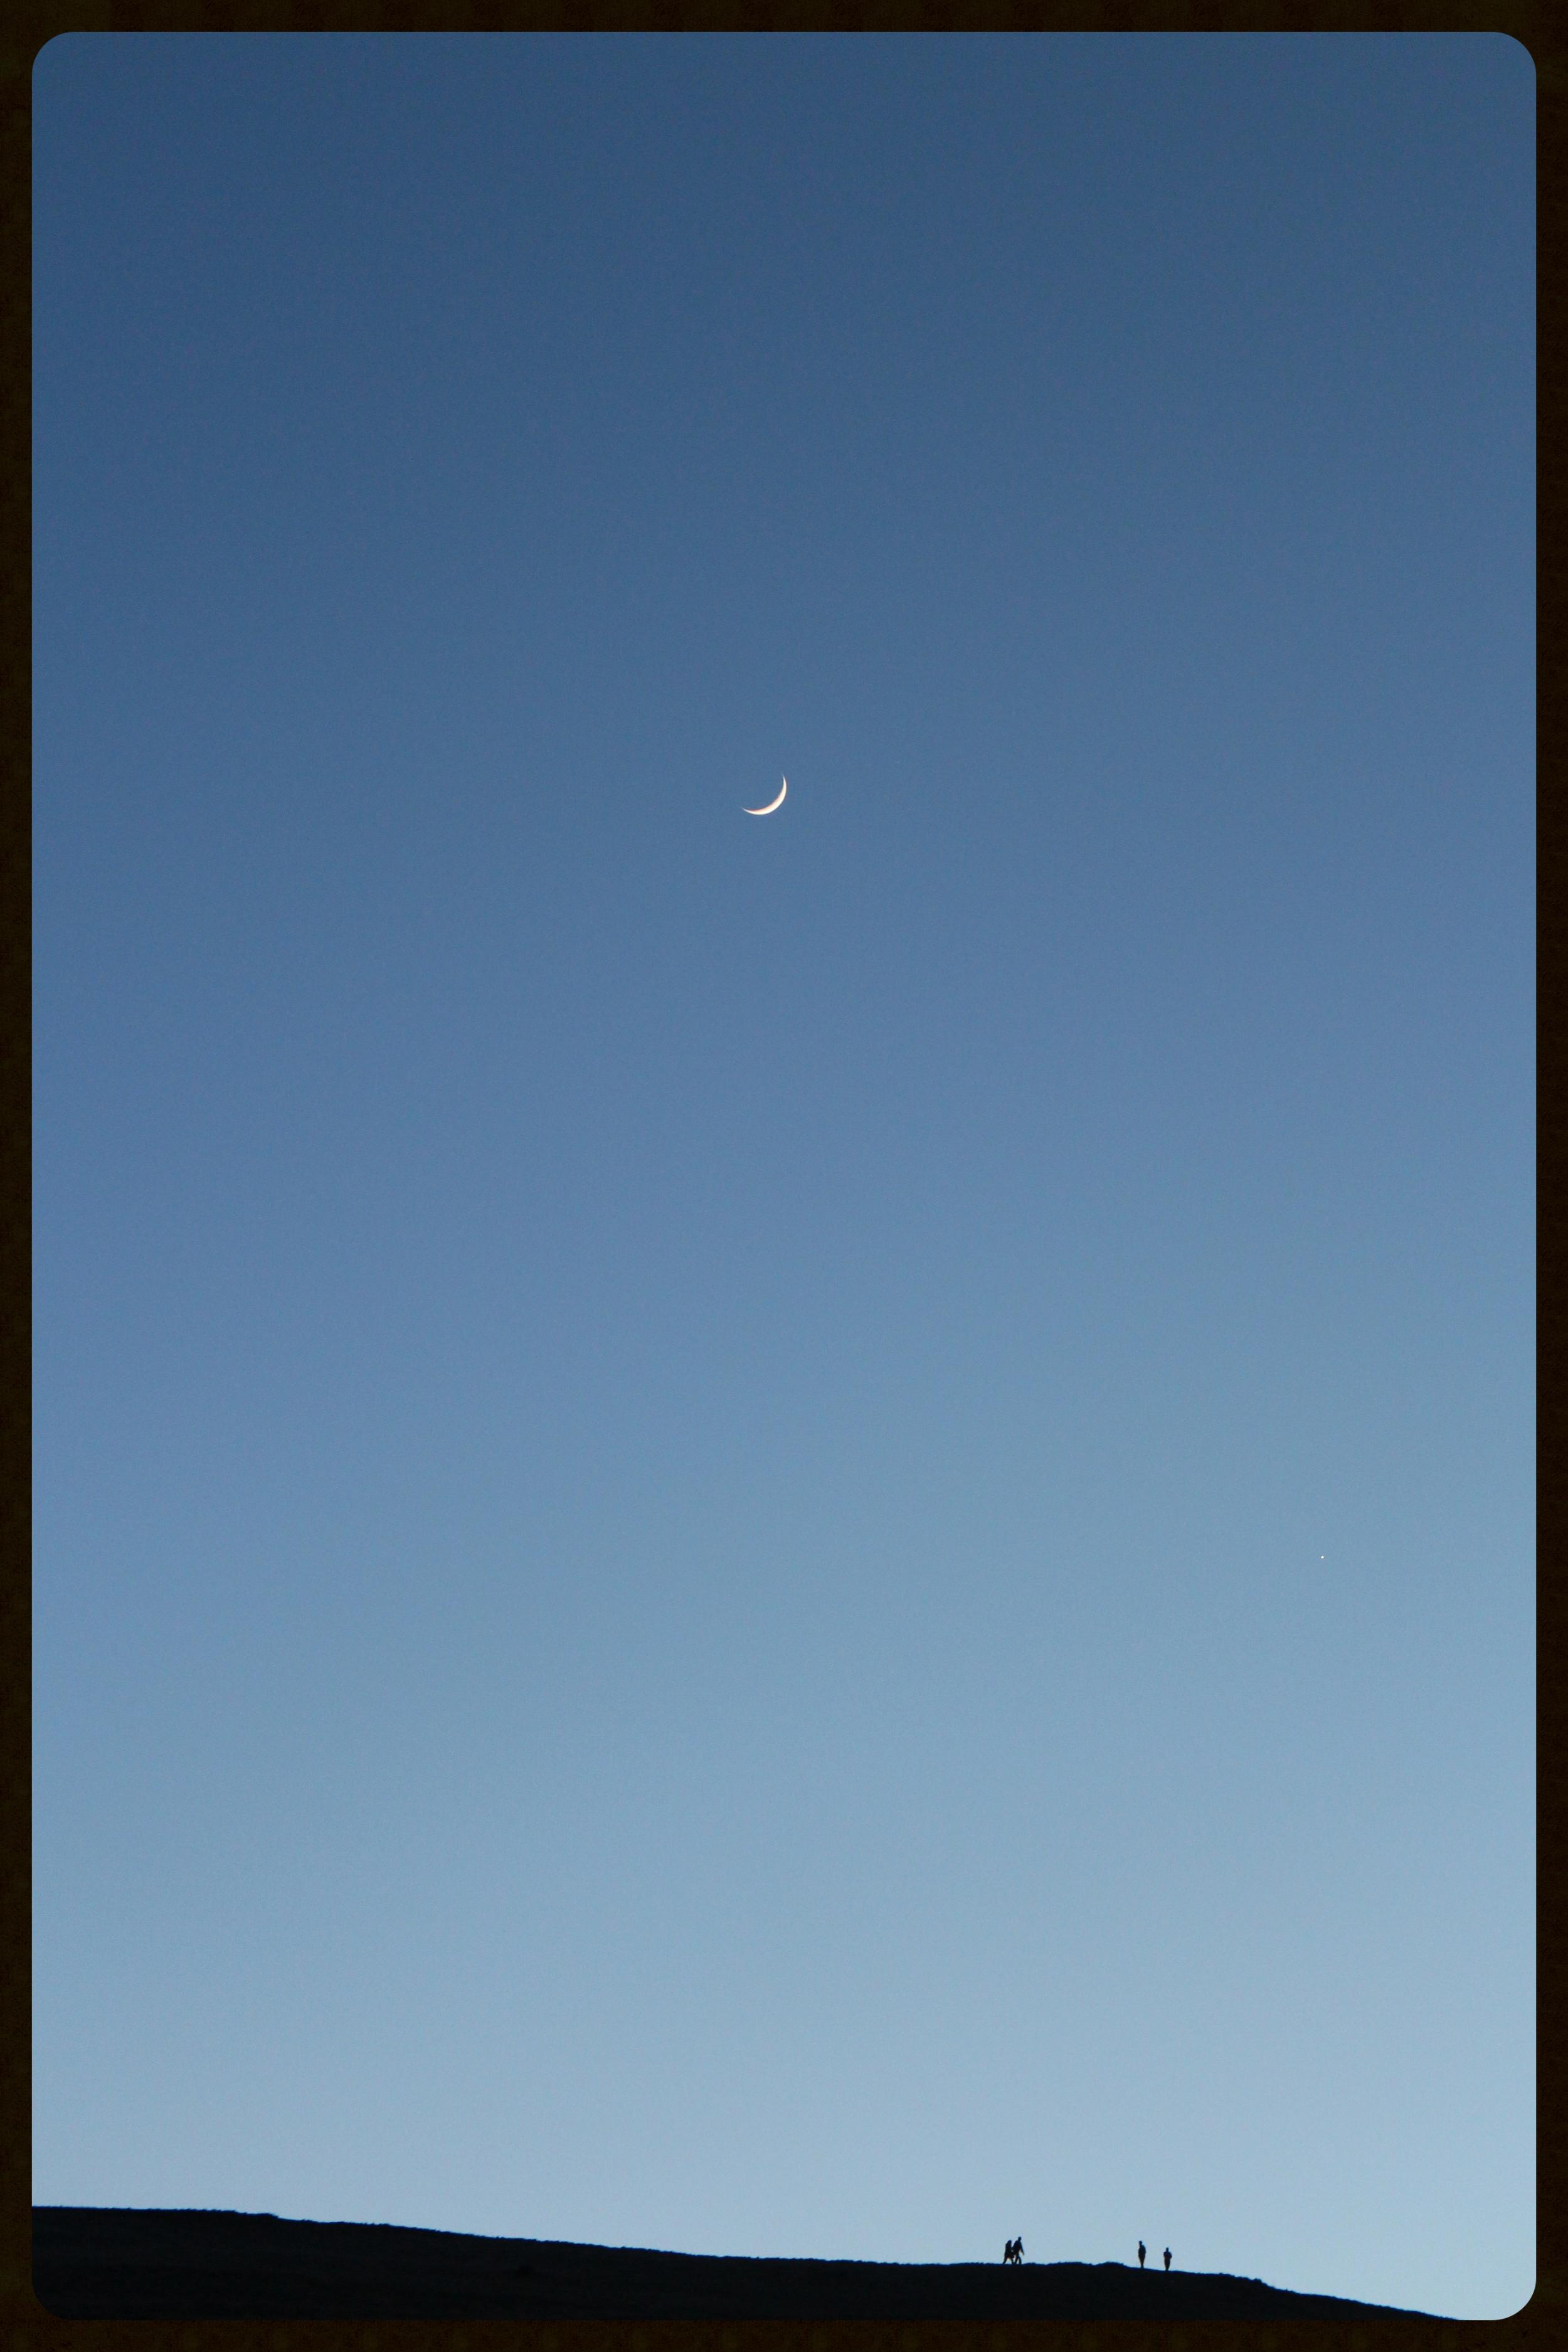 Biodynamics-the-moon.jpg